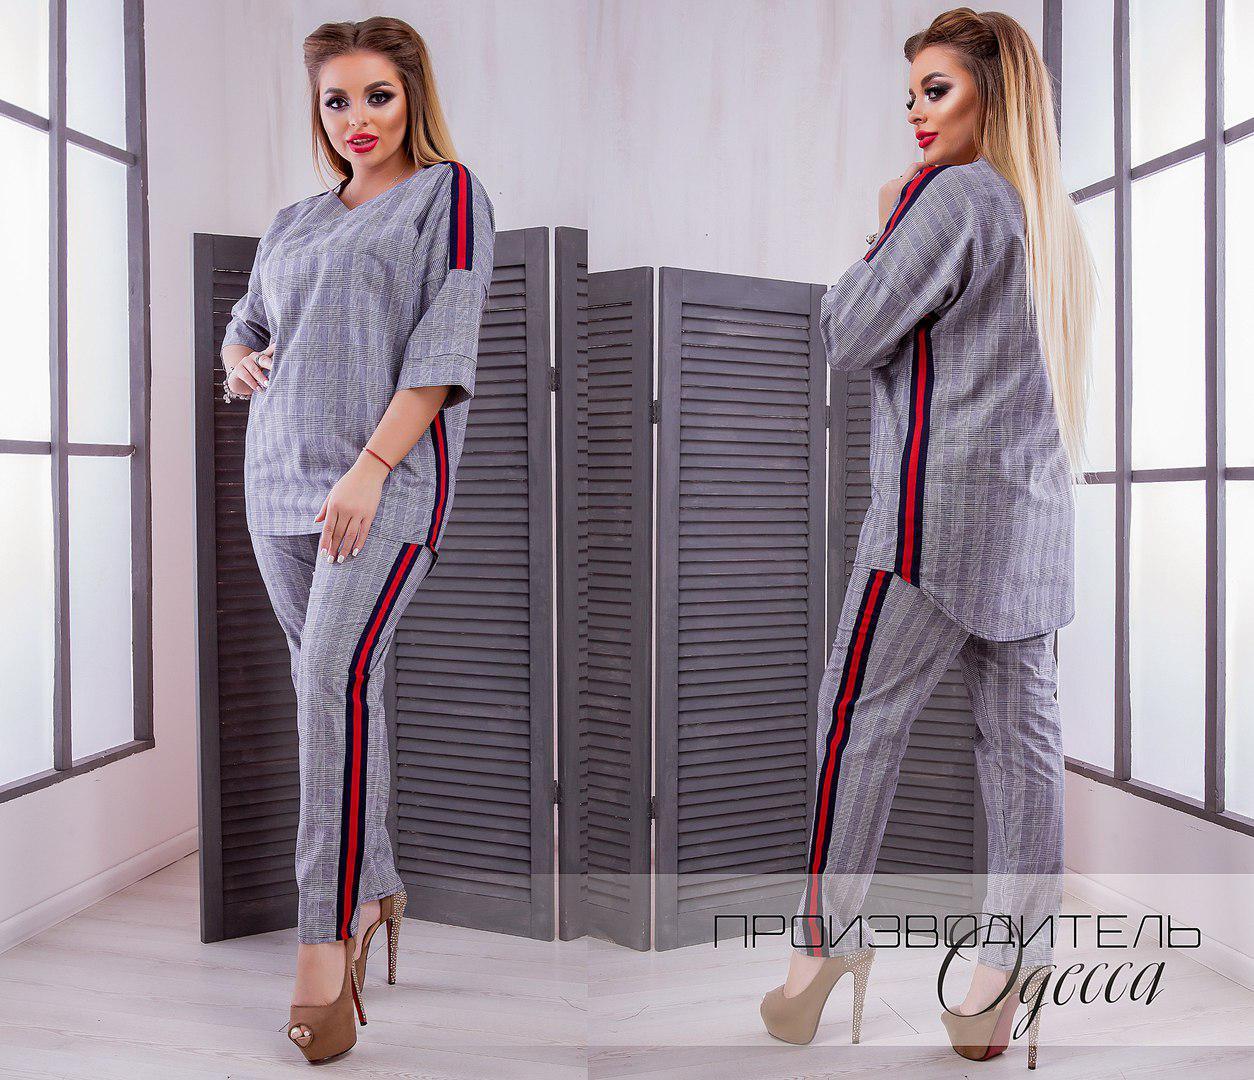 9f43b638780a Женский брючный костюм двойка штаны+кофта лен батал размеры:48-62  РАСПРОДАЖА!